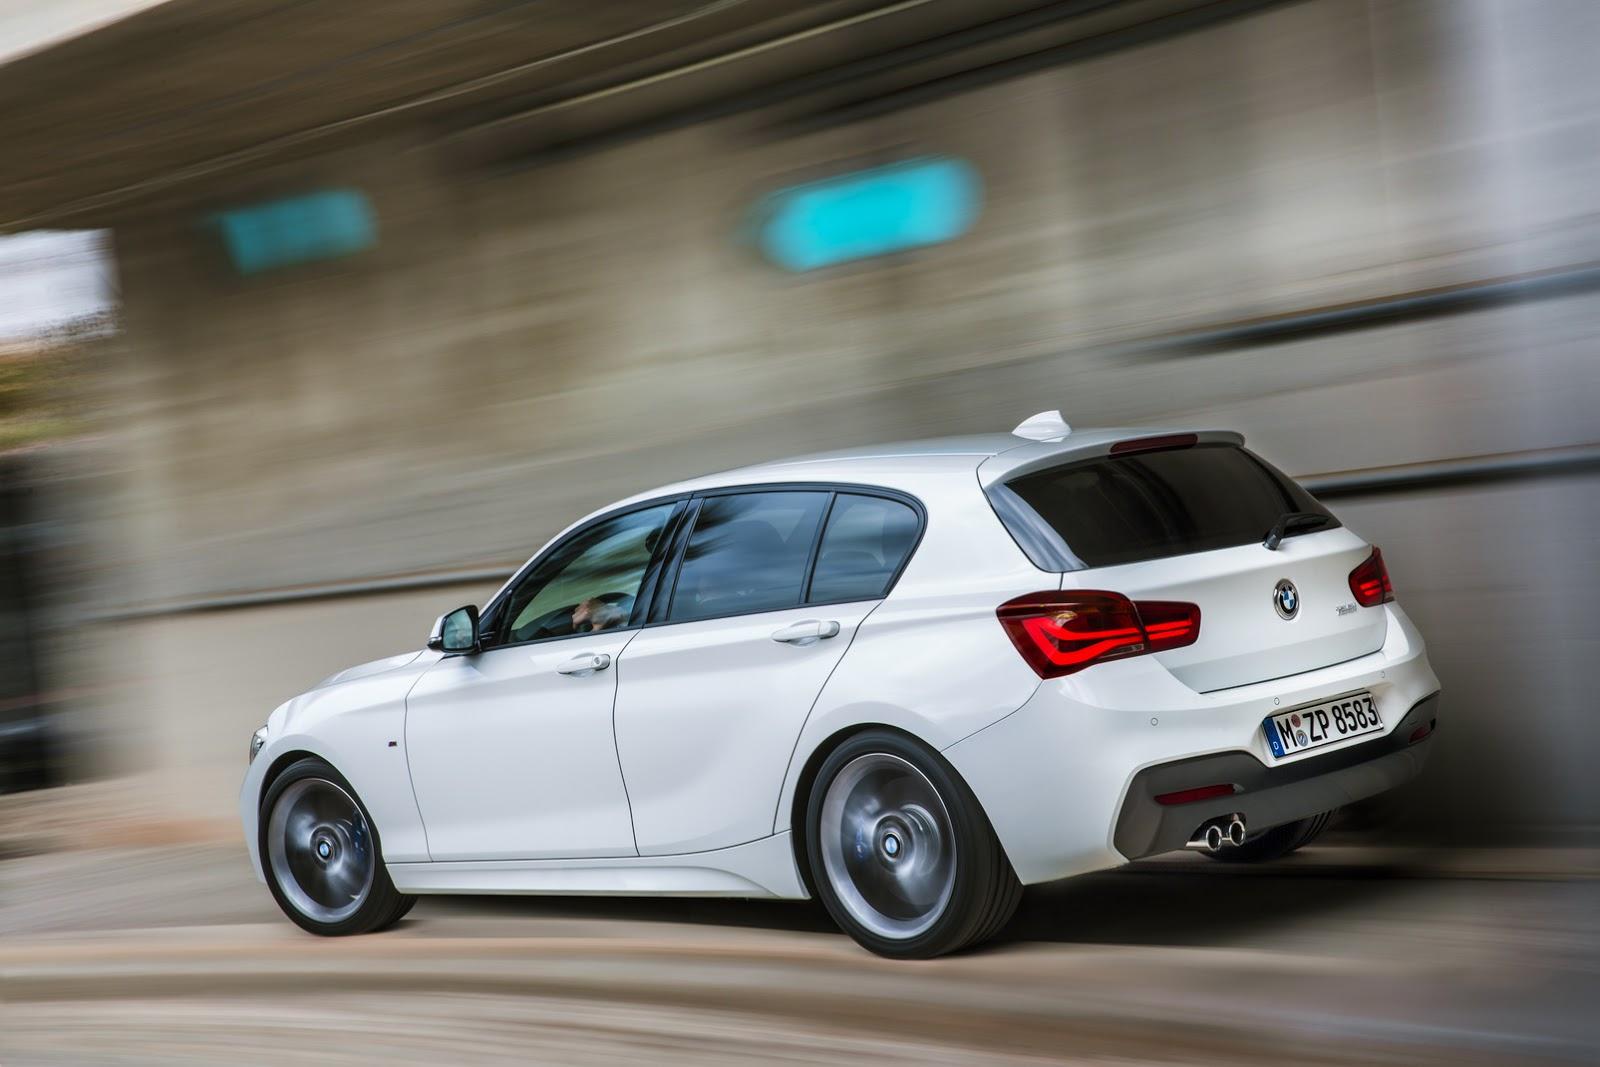 BMW Seria 1 facelift 2015 - floteauto 5